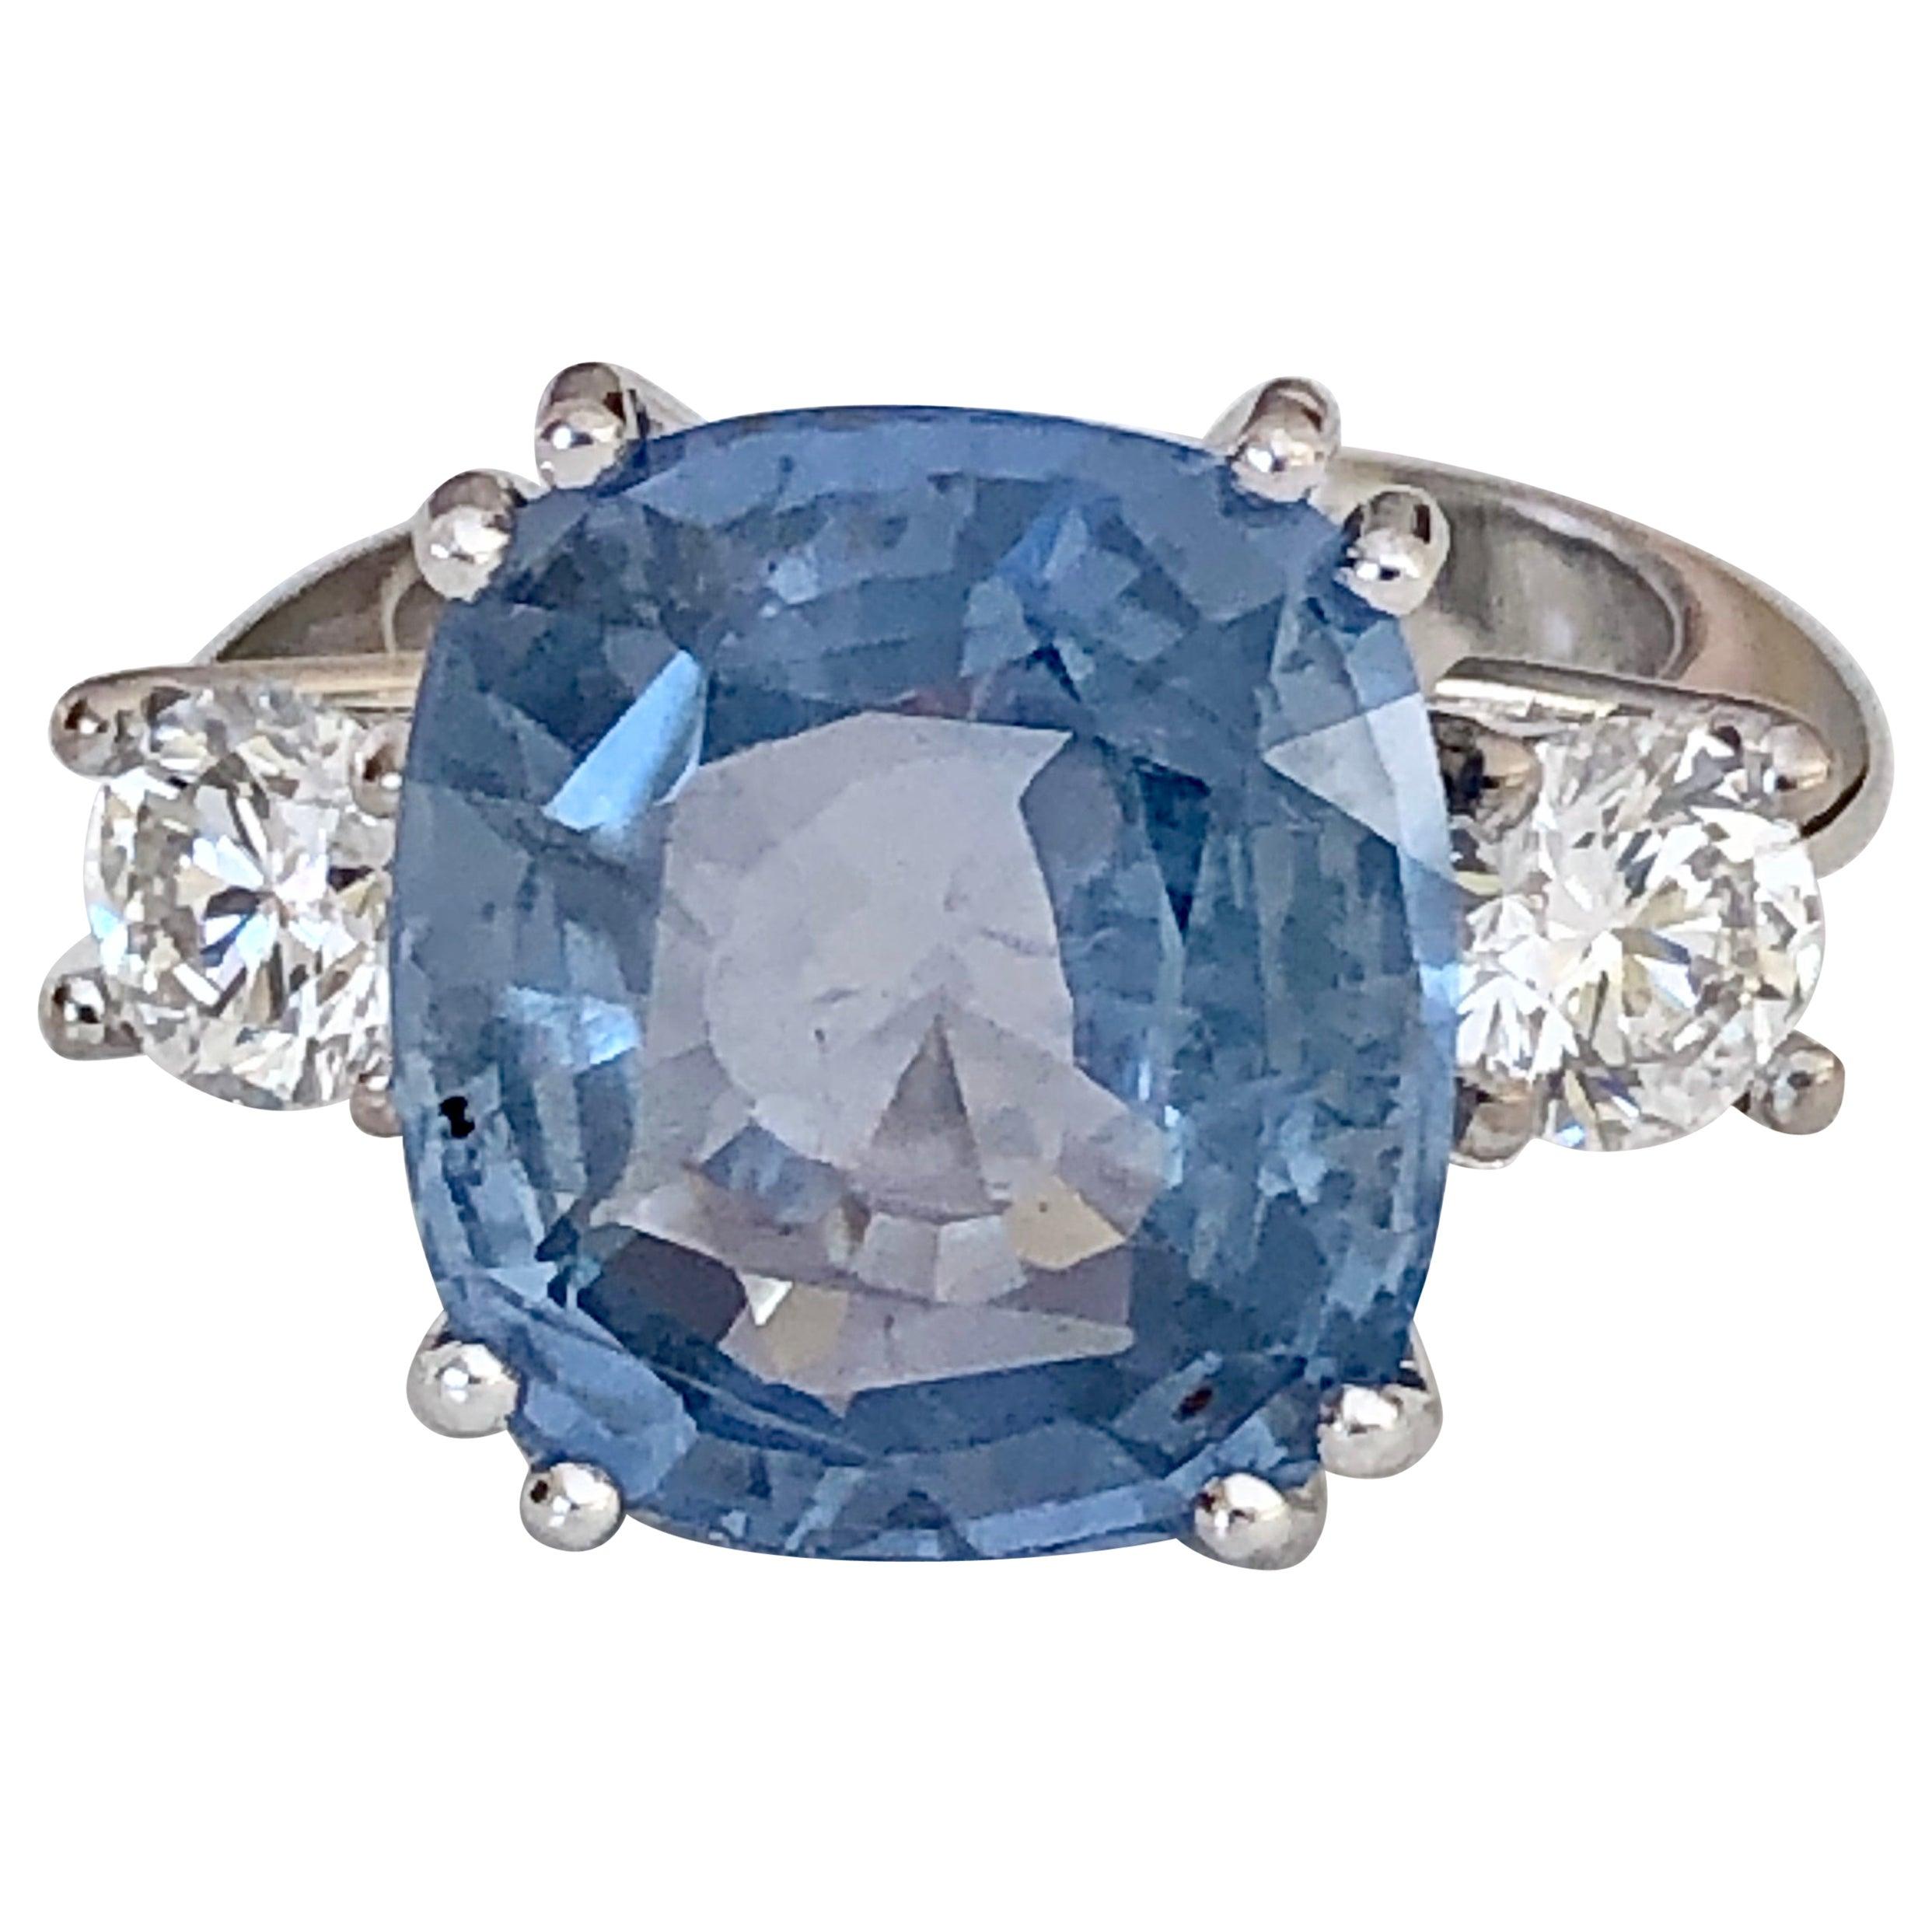 13.10 Carat Unheated Ceylon Blue Sapphire and Diamond Engagement Ring 18K